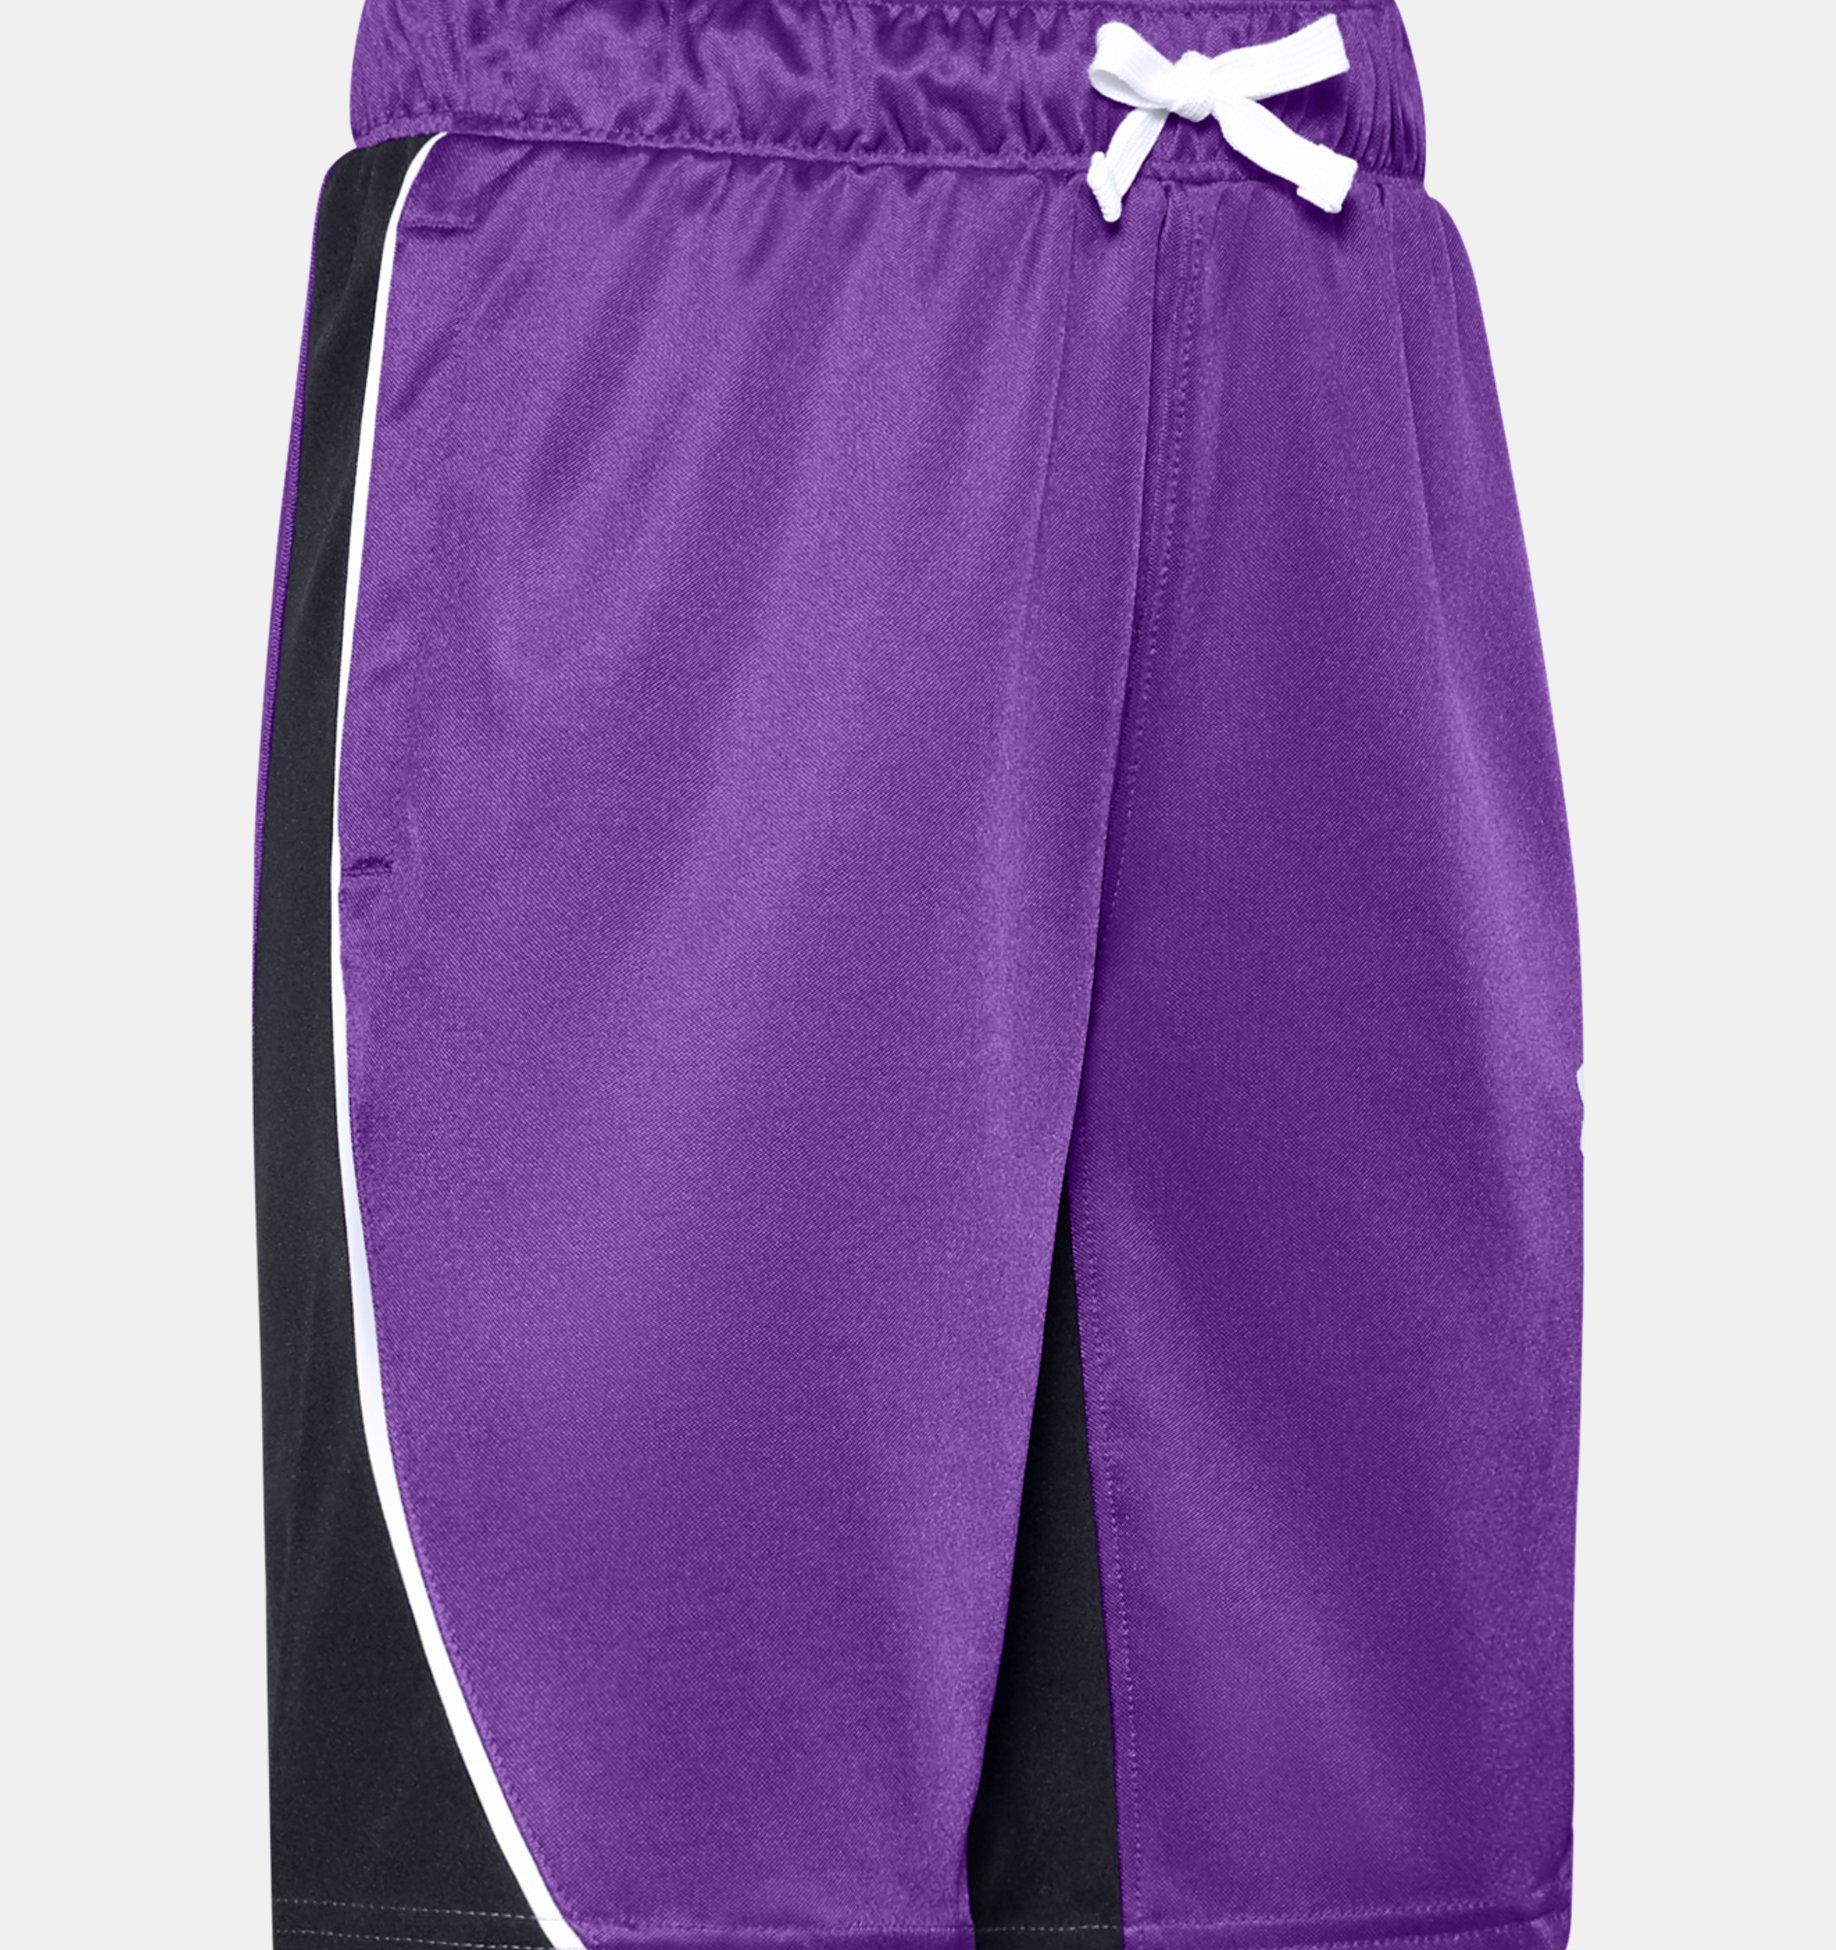 Underarmour Girls UA Basketball Shorts